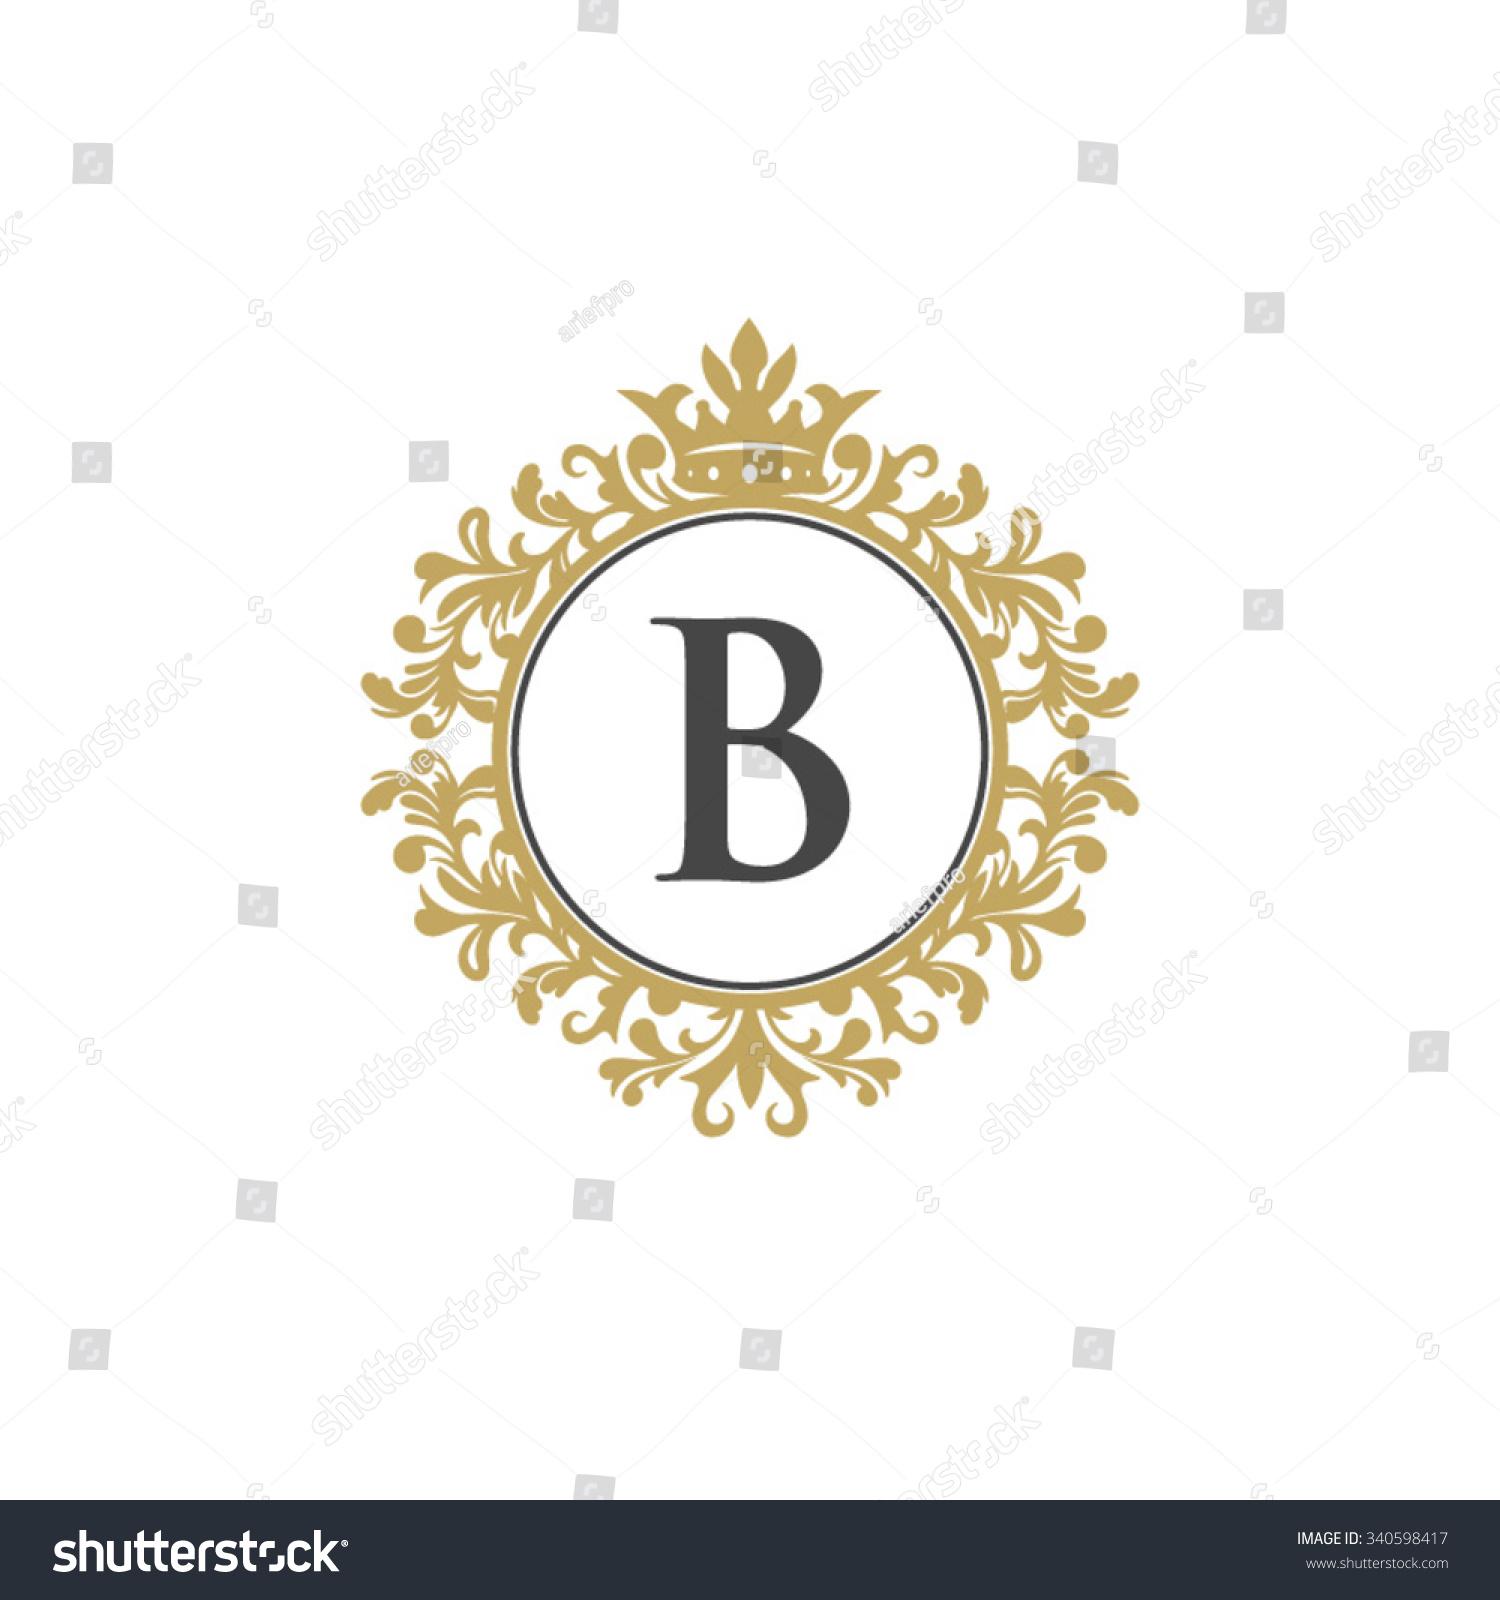 Tj initial luxury ornament monogram logo stock vector - B Initial Logo Luxury Ornament Crown Logo